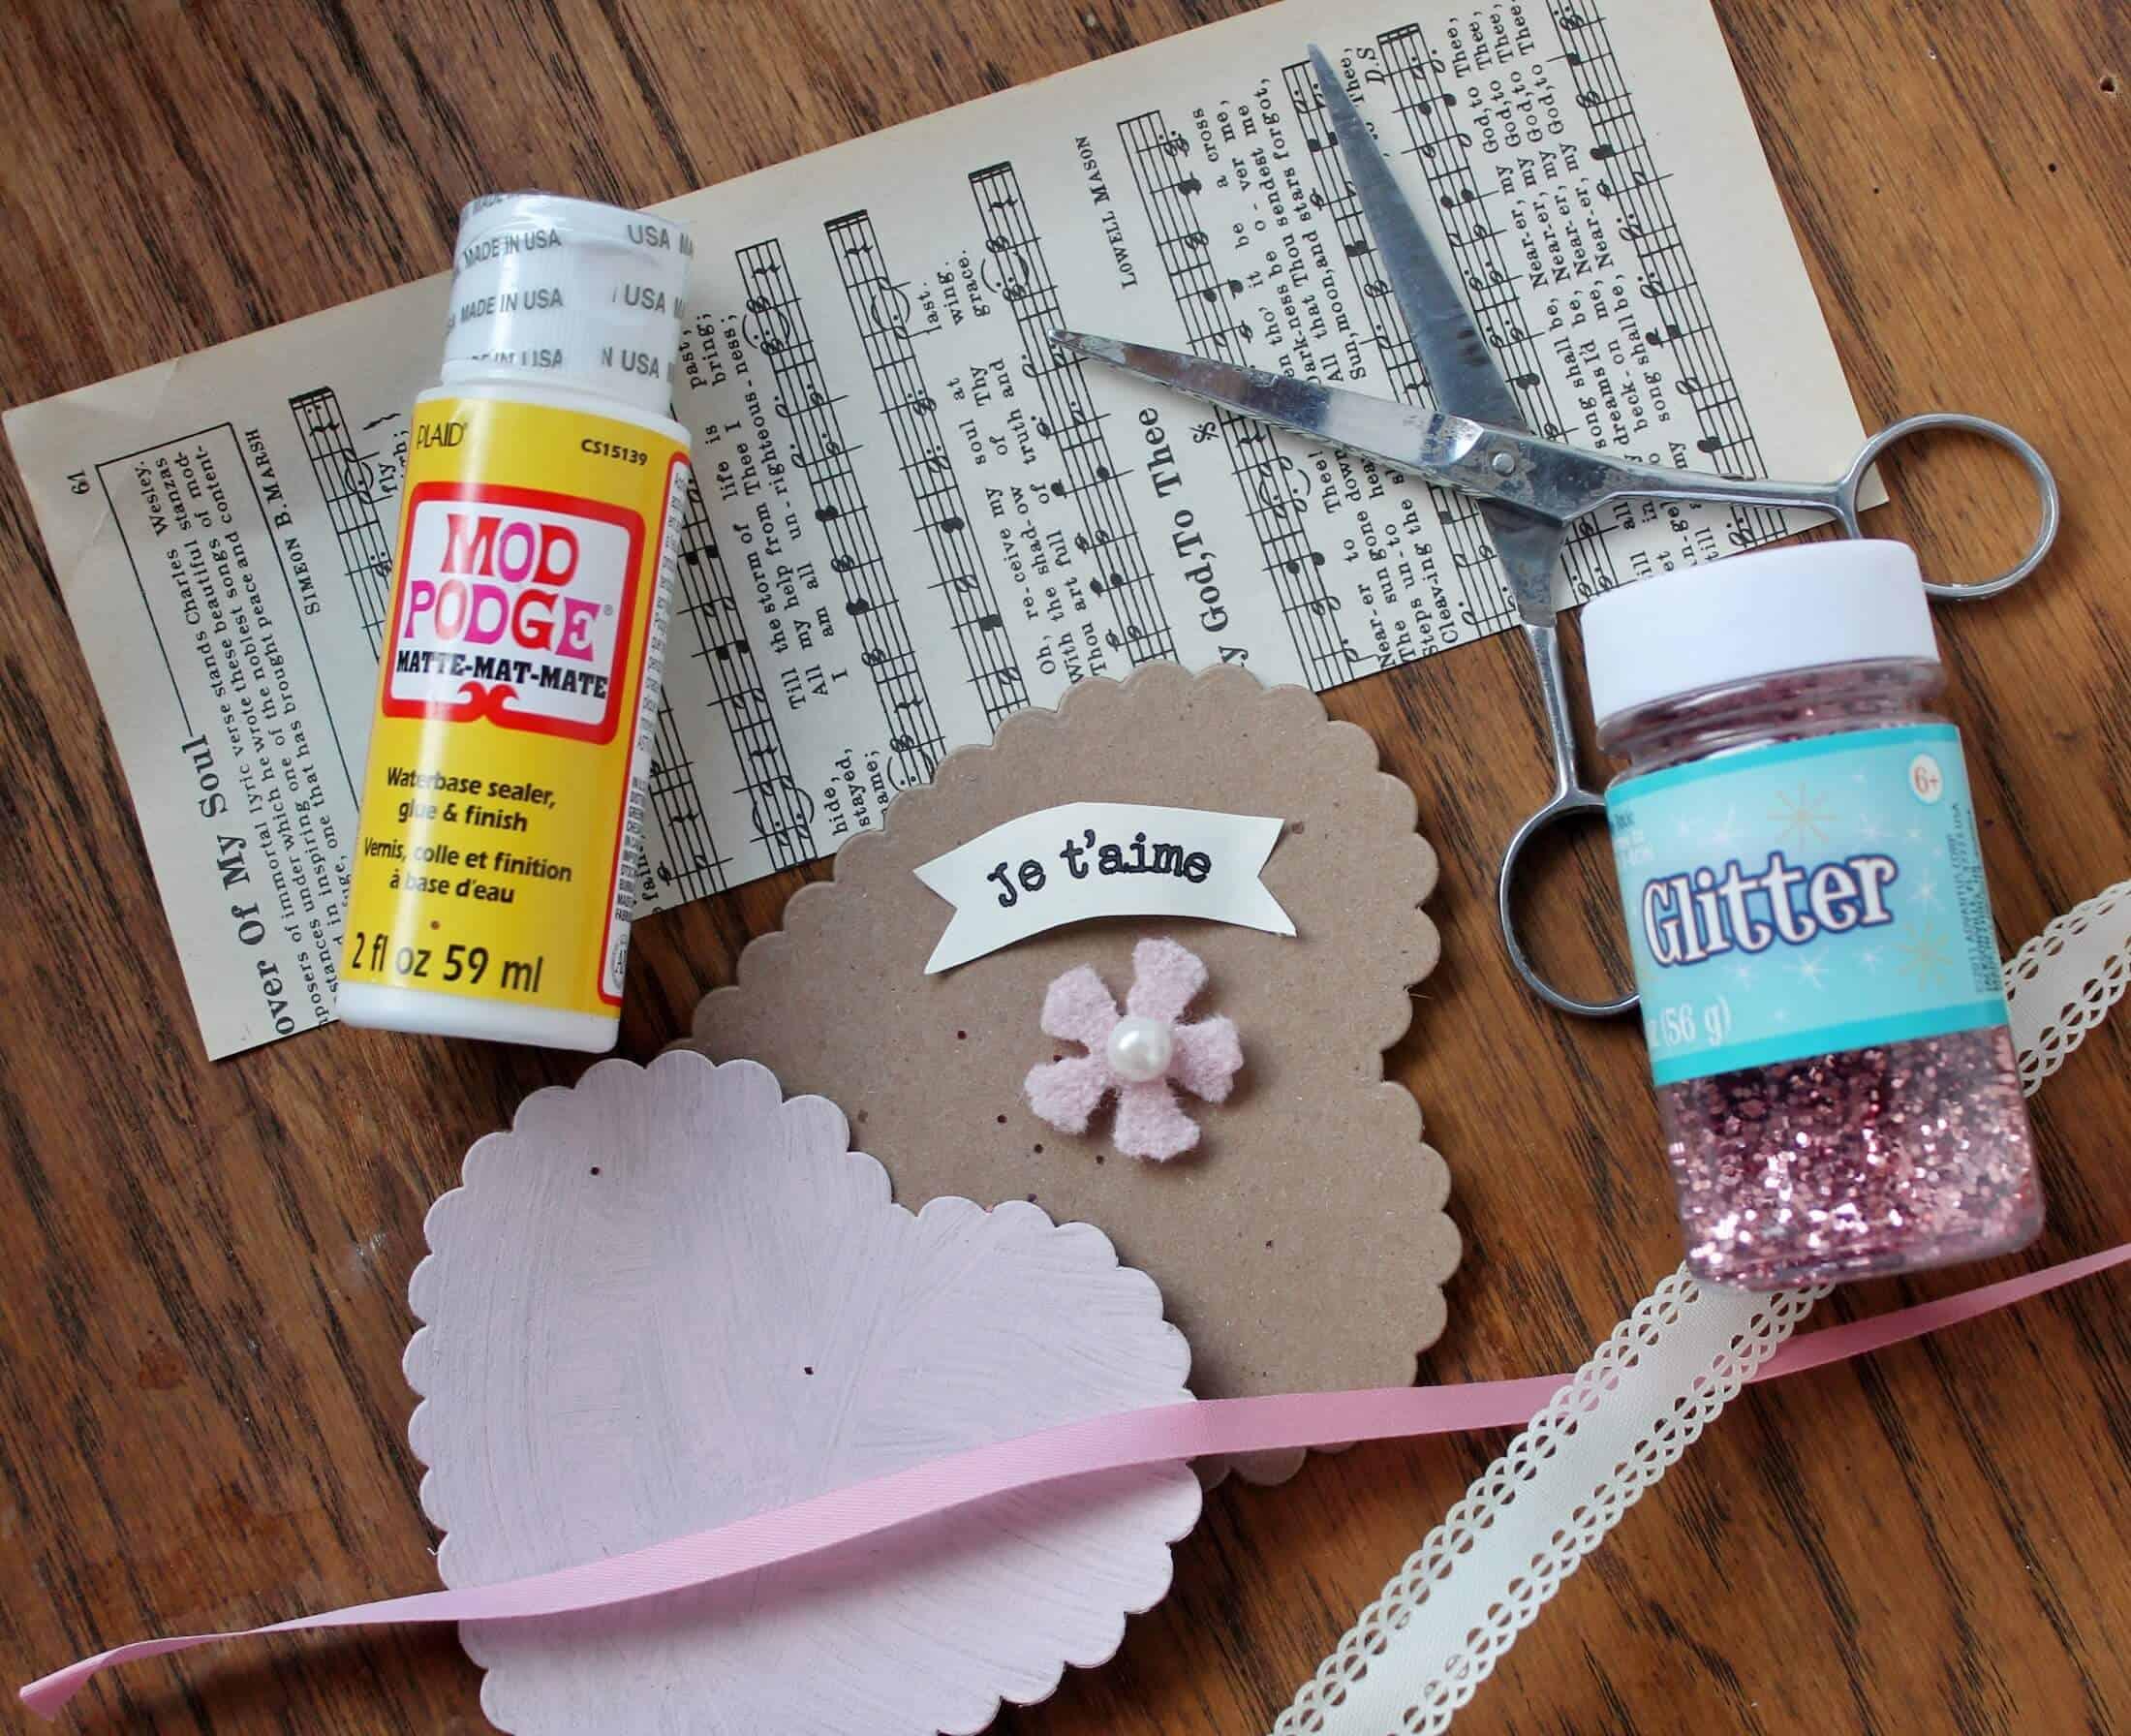 Supplies for Glittery Valentine's